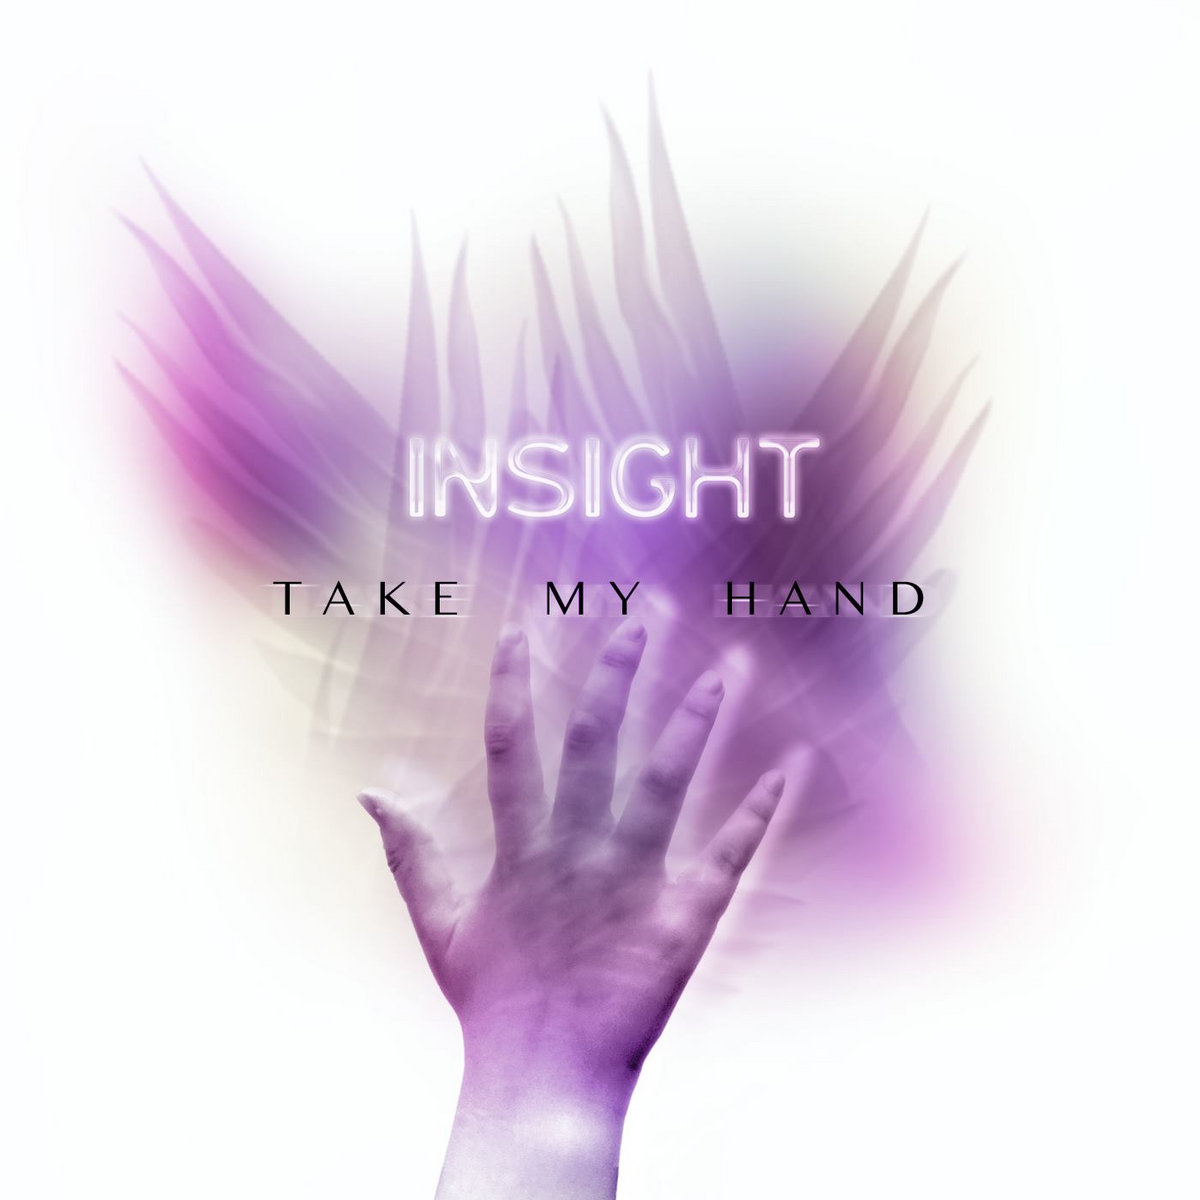 Insight - Take My Hand - Insight - Take My Hand